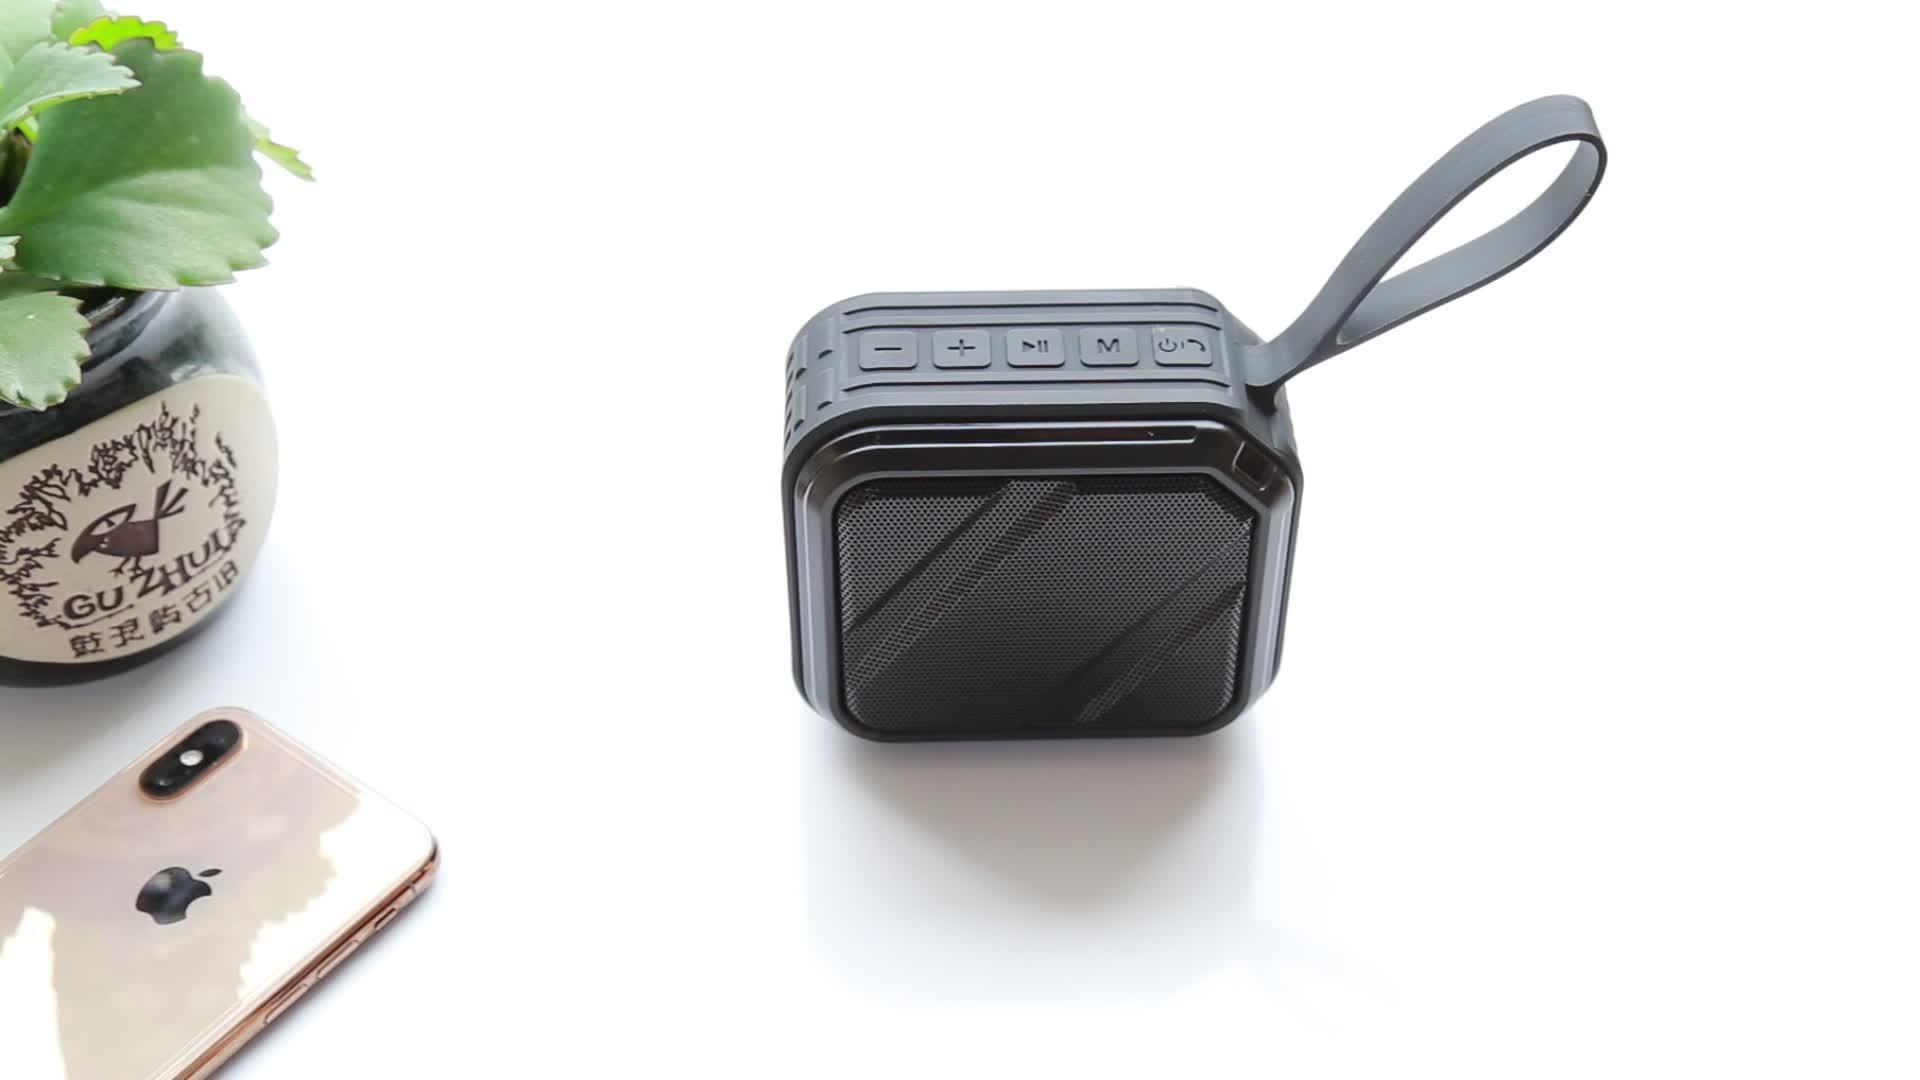 BS31D su geçirmez IPX7 kablosuz bluetooth hoparlör süper ses çok fonksiyonlu kaliteli taşınabilir kablosuz hoparlör